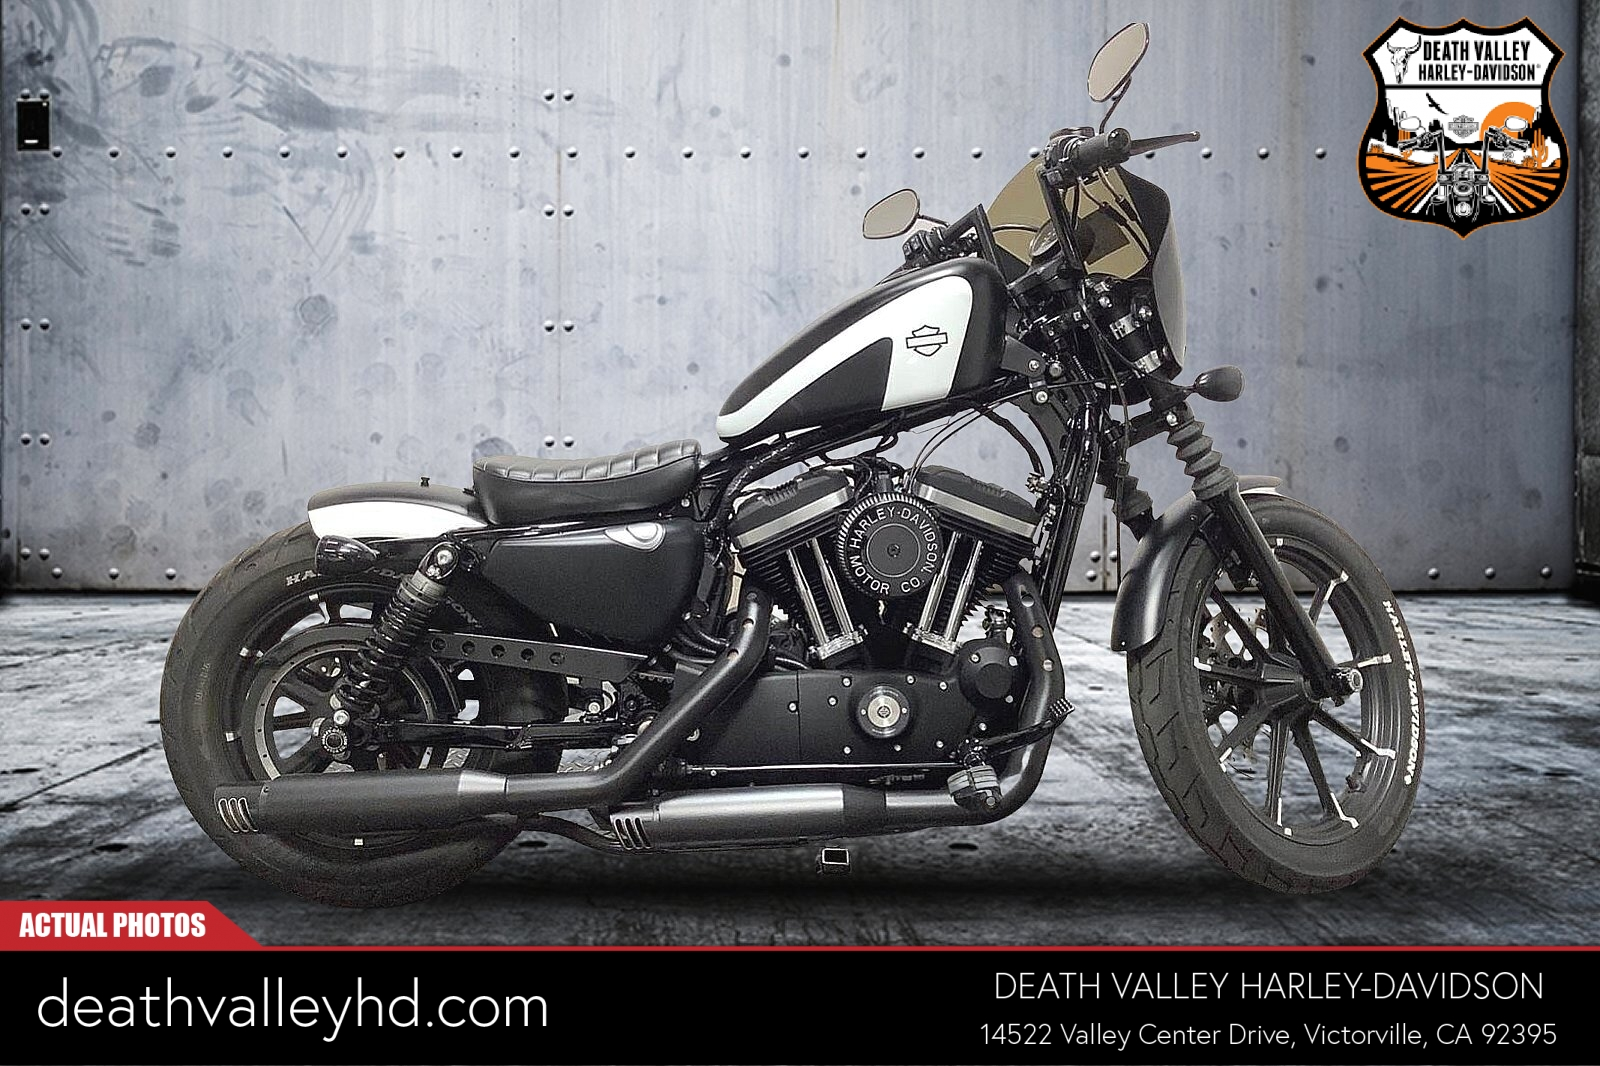 Harley-Davidson [2]